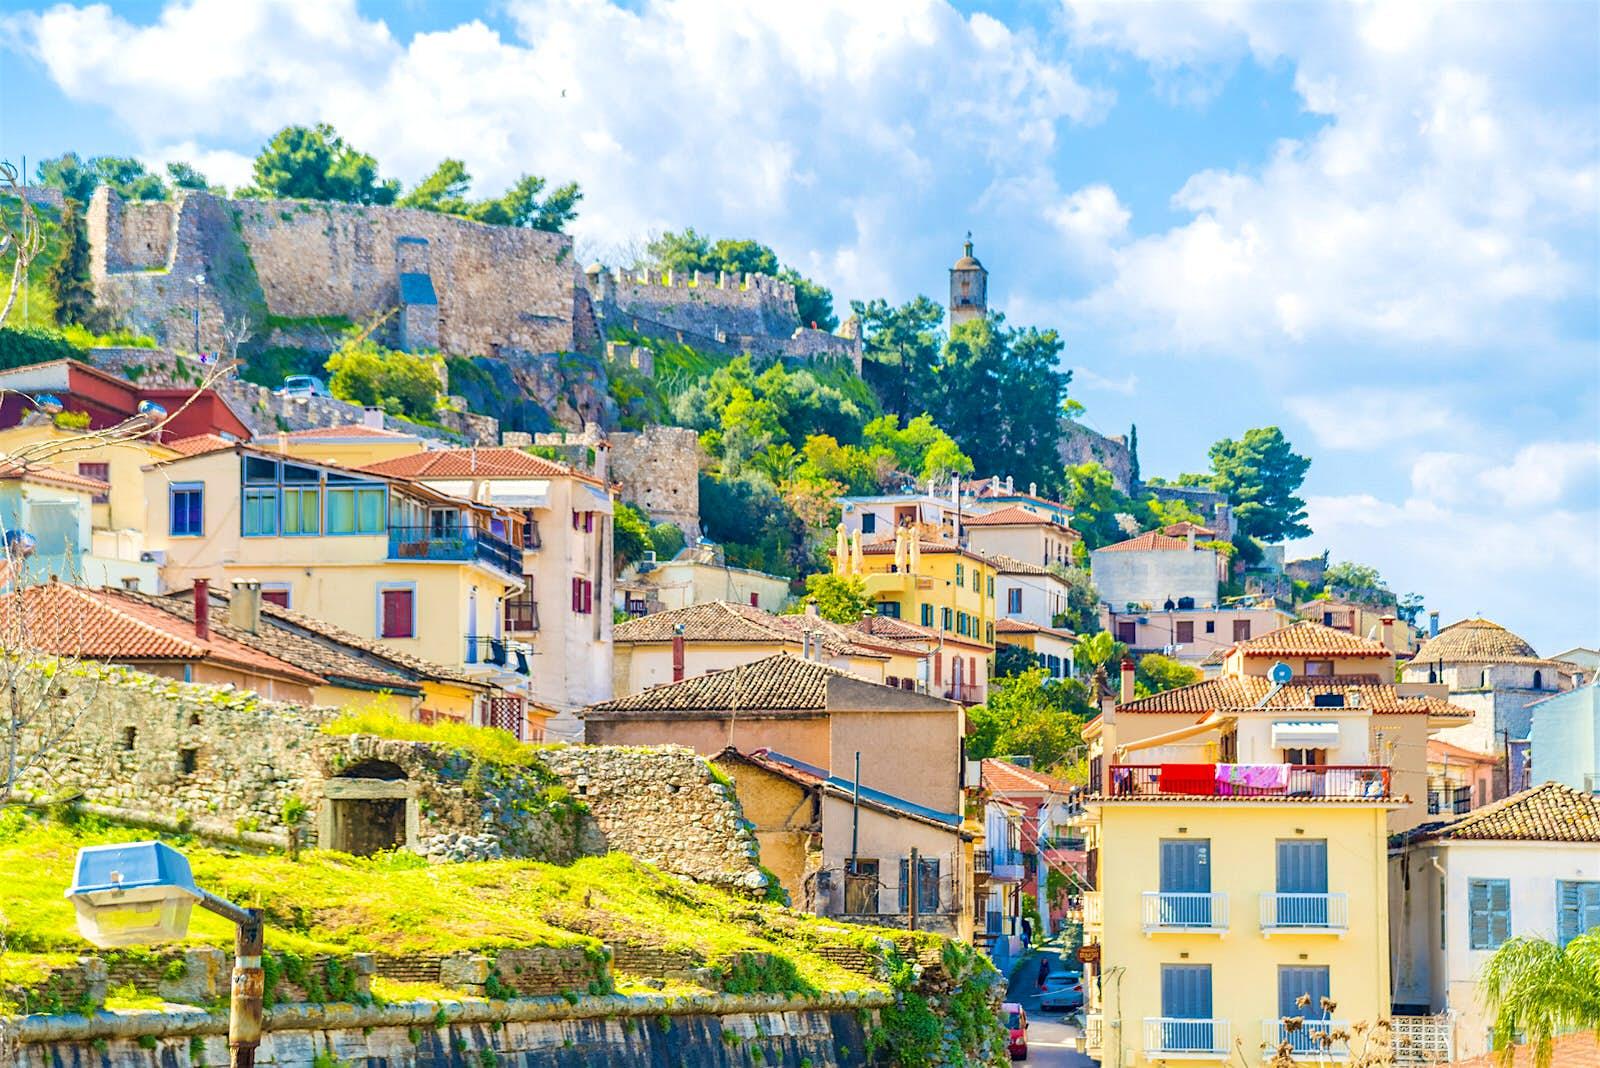 Nafplio's colourful old town © Alexandros Petrakis / Shutterstock